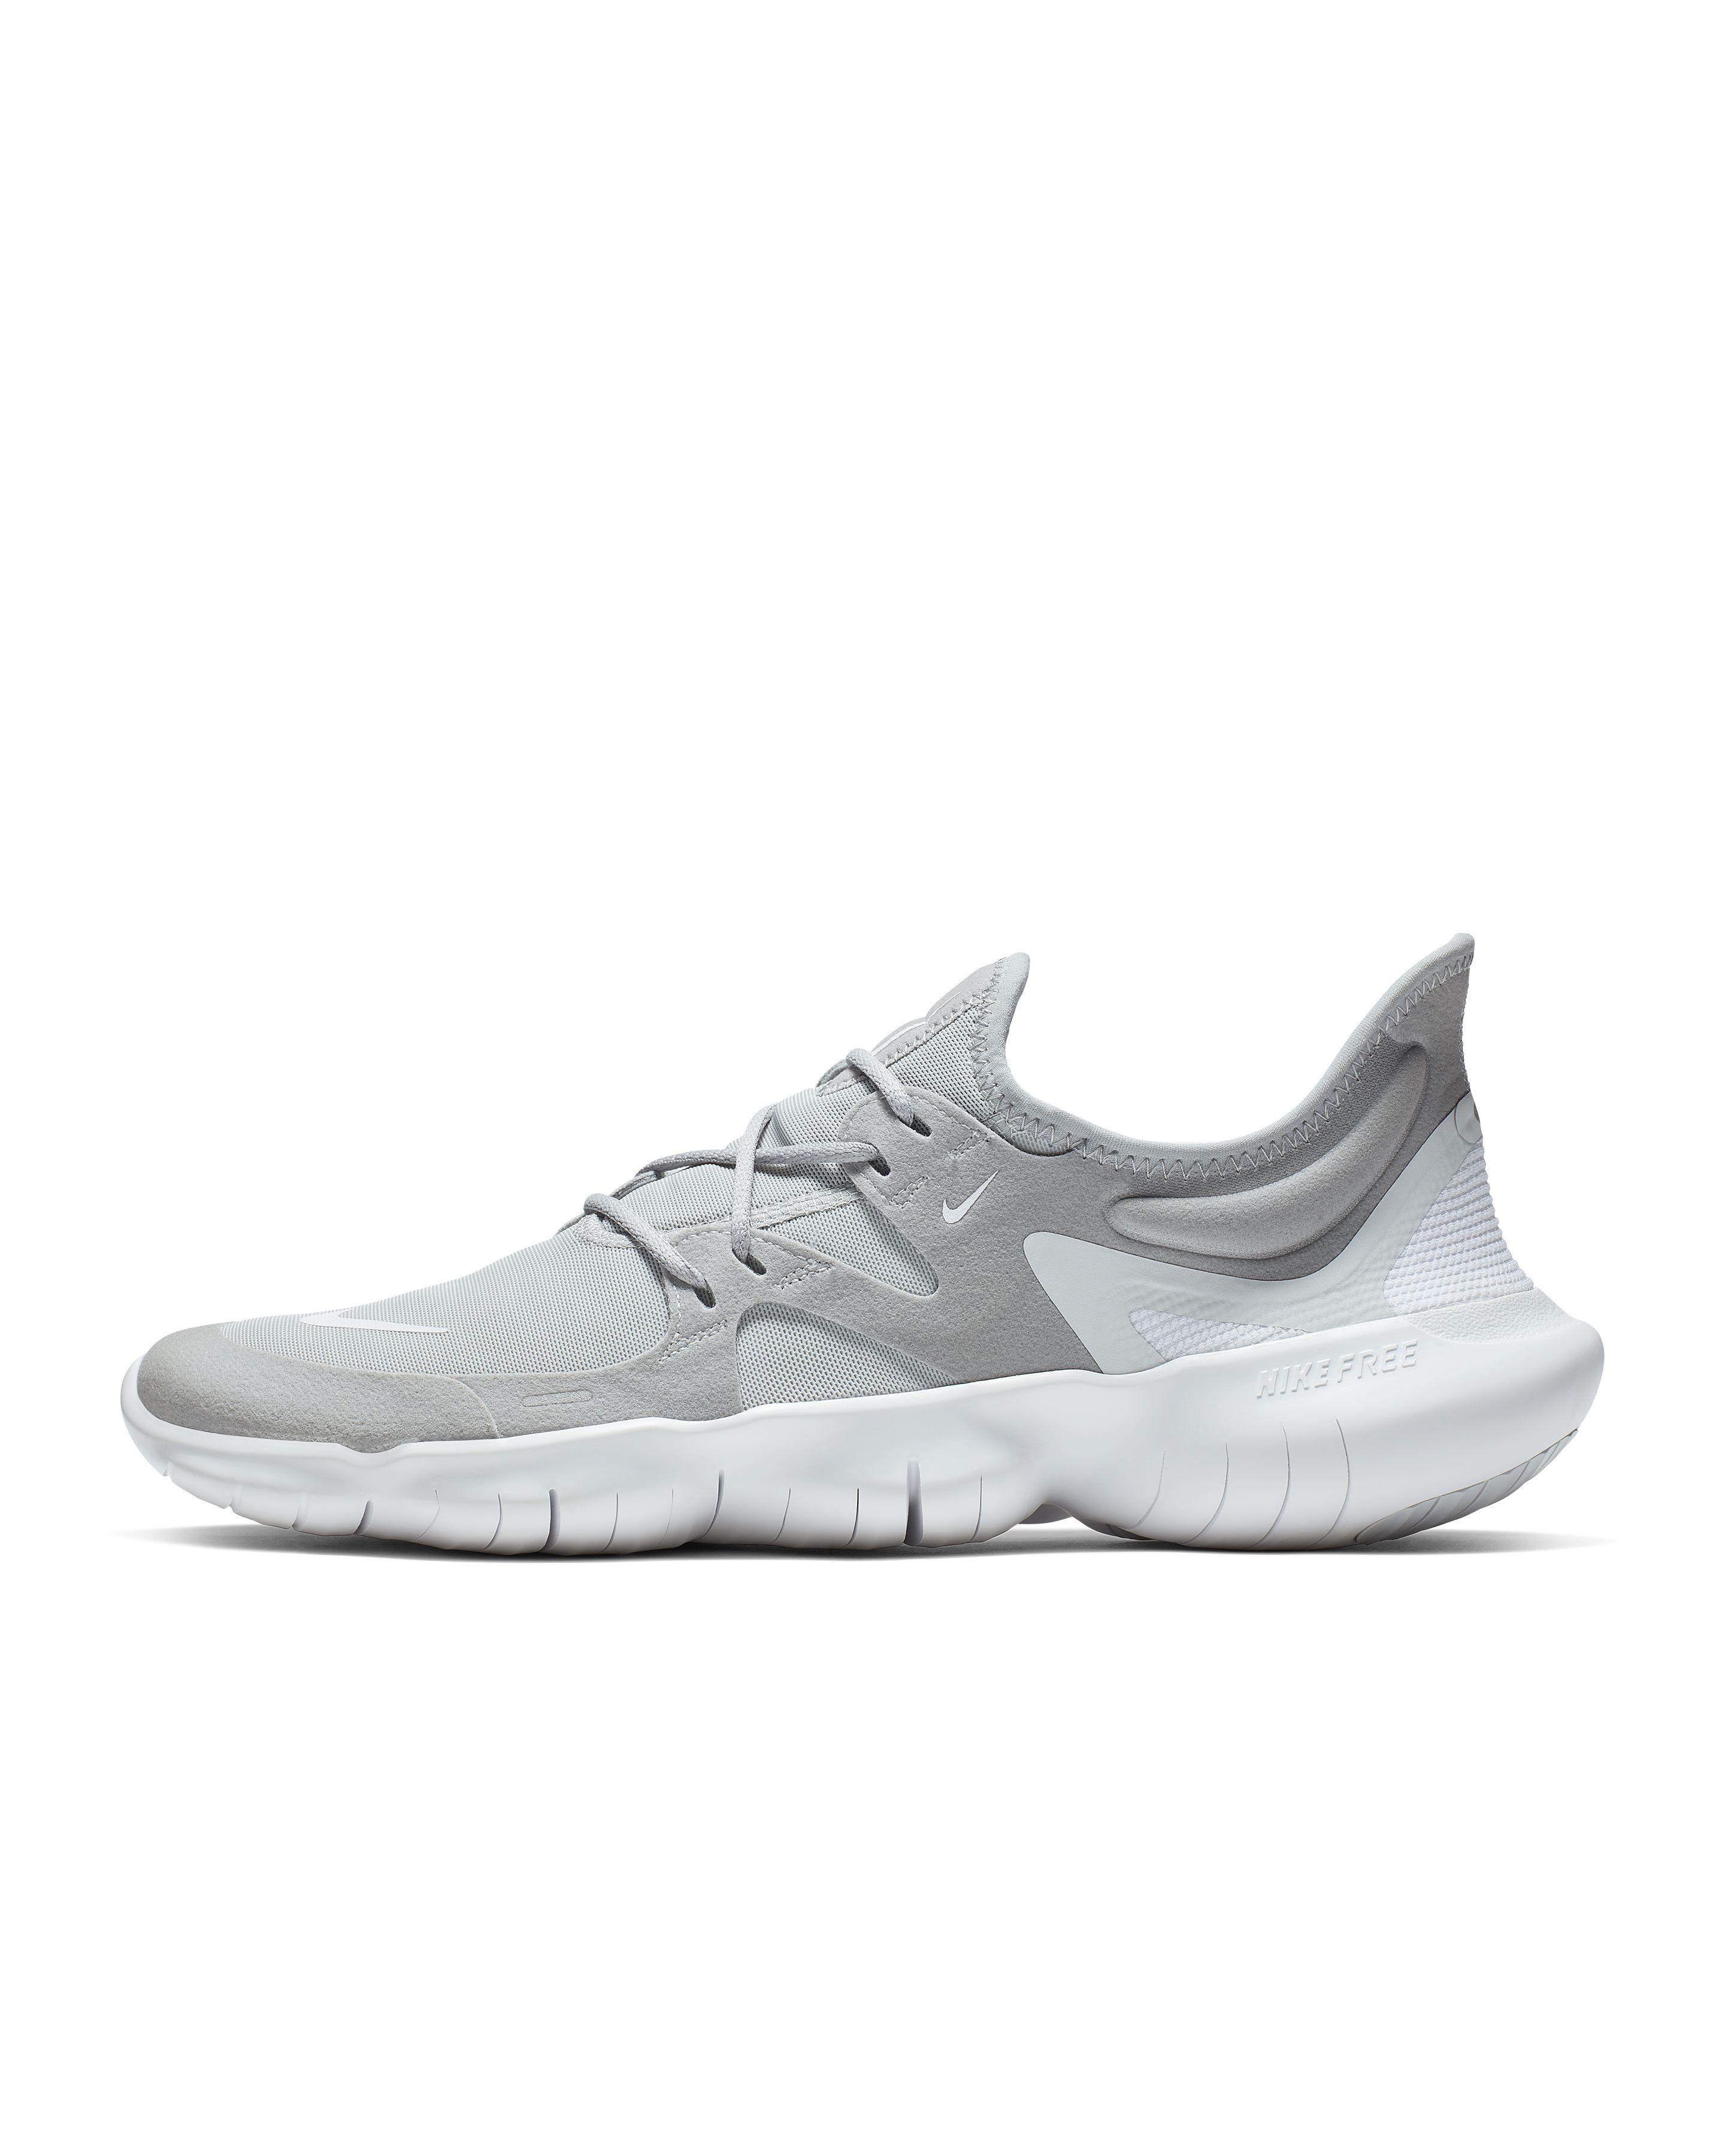 5b4316d663d747 Best Nike Running Shoes | Nike Shoe Reviews 2019